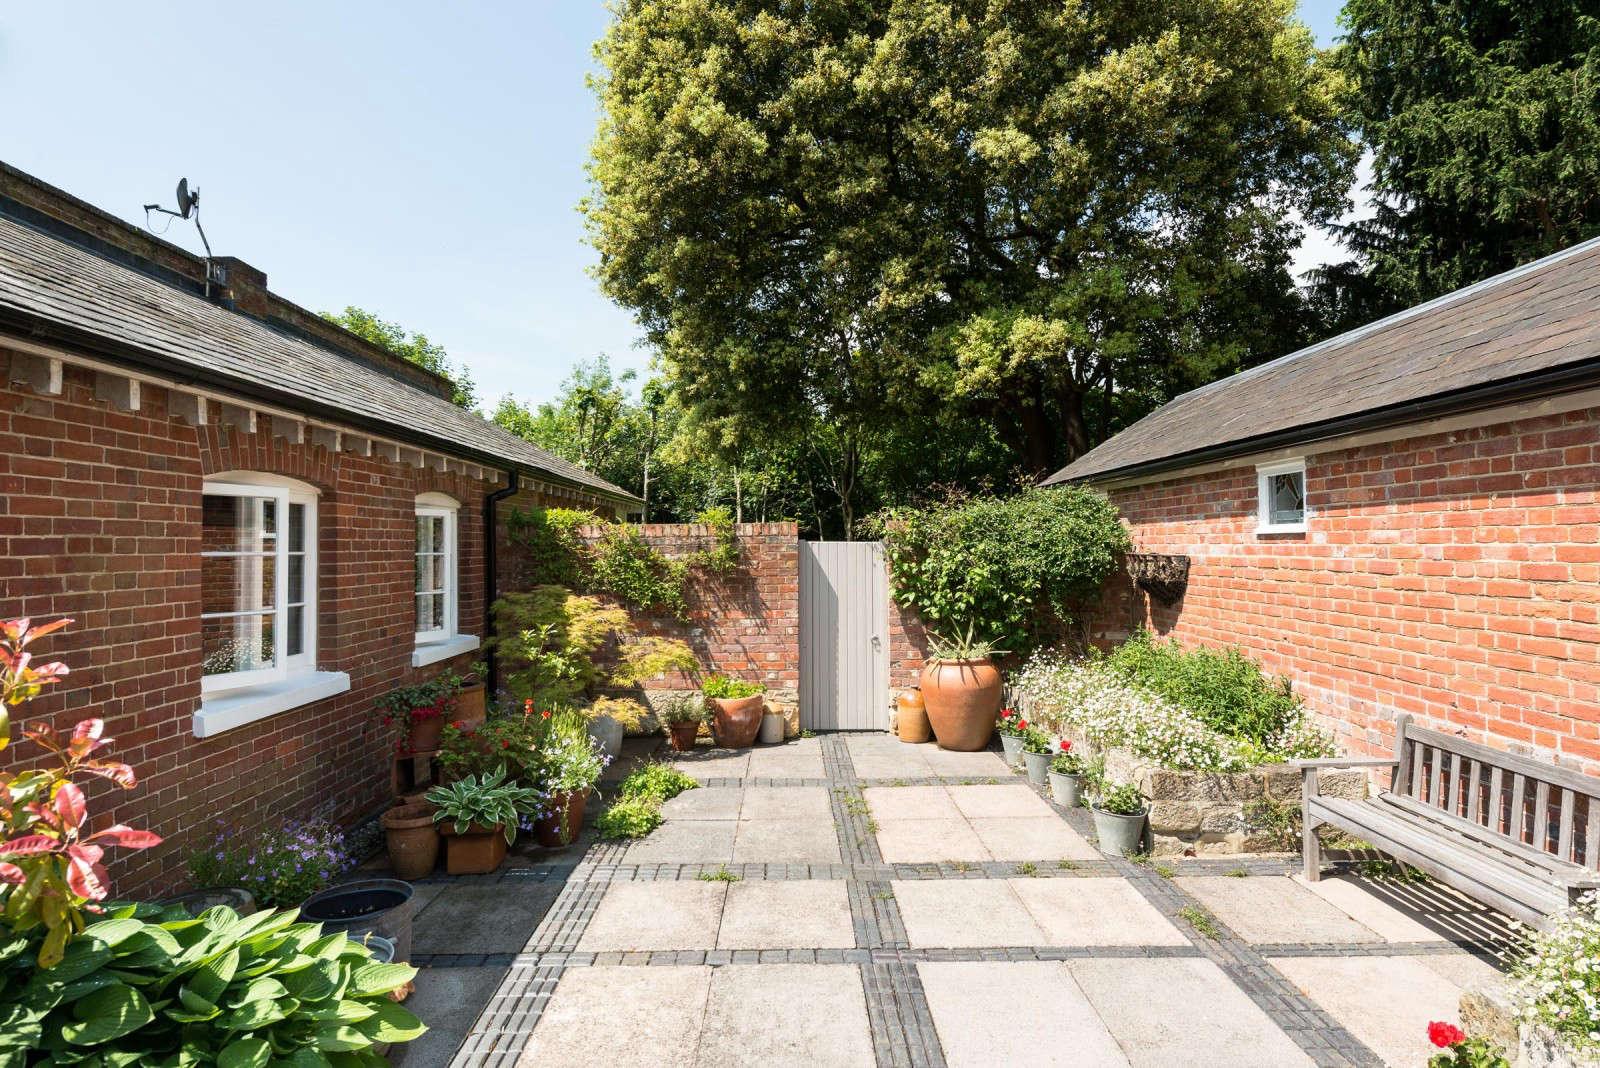 greenhouse-conversion-kent-themodernhouse-patio-brick-7